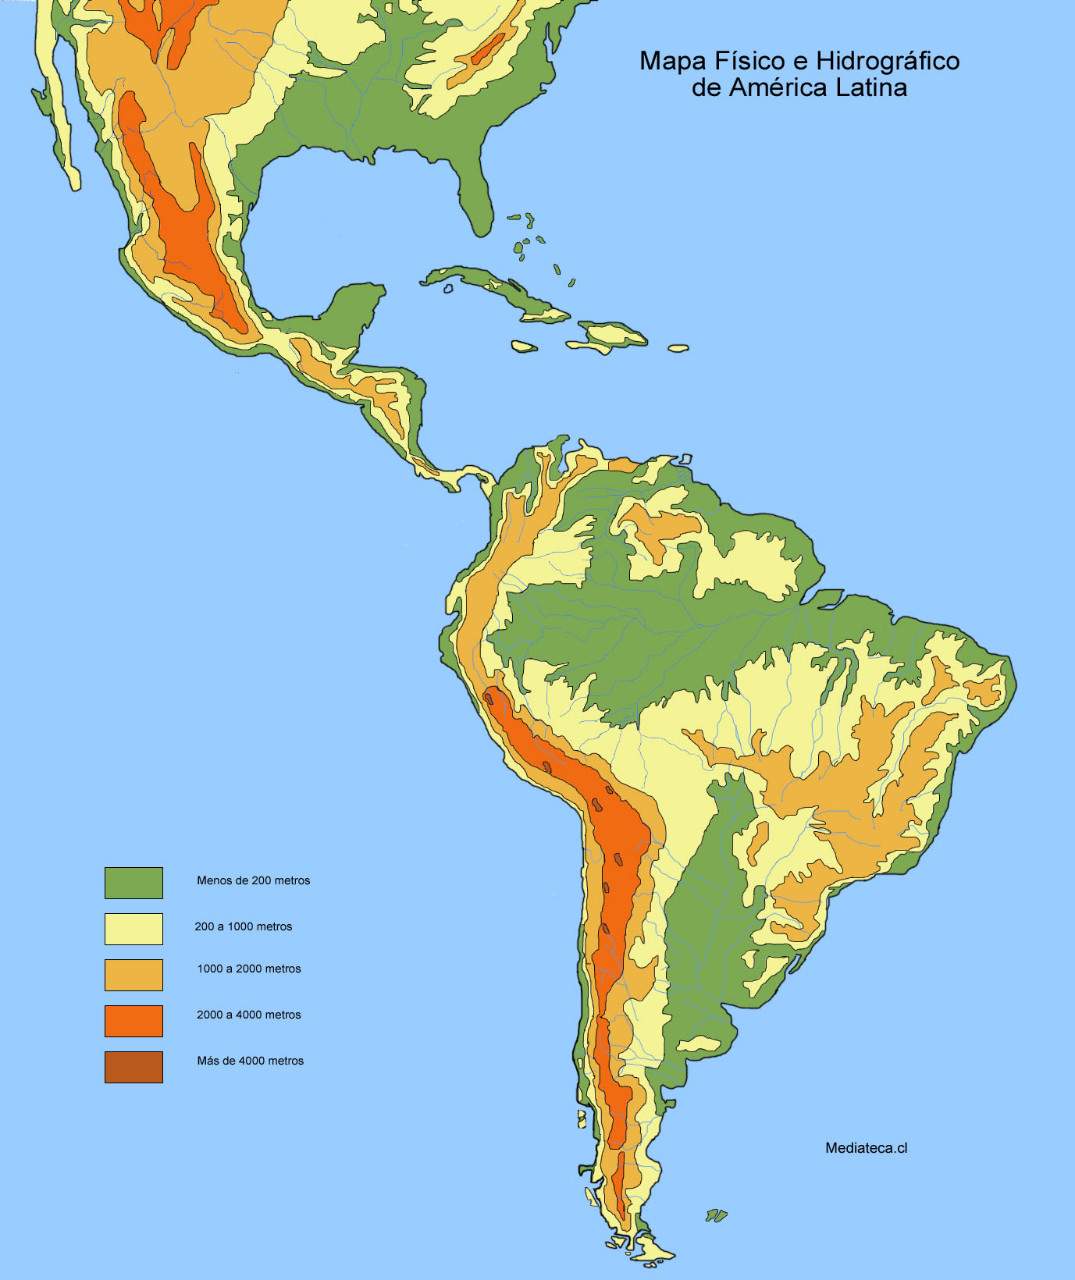 Mapa de Amrica Latina  Mapa Fsico Geogrfico Poltico